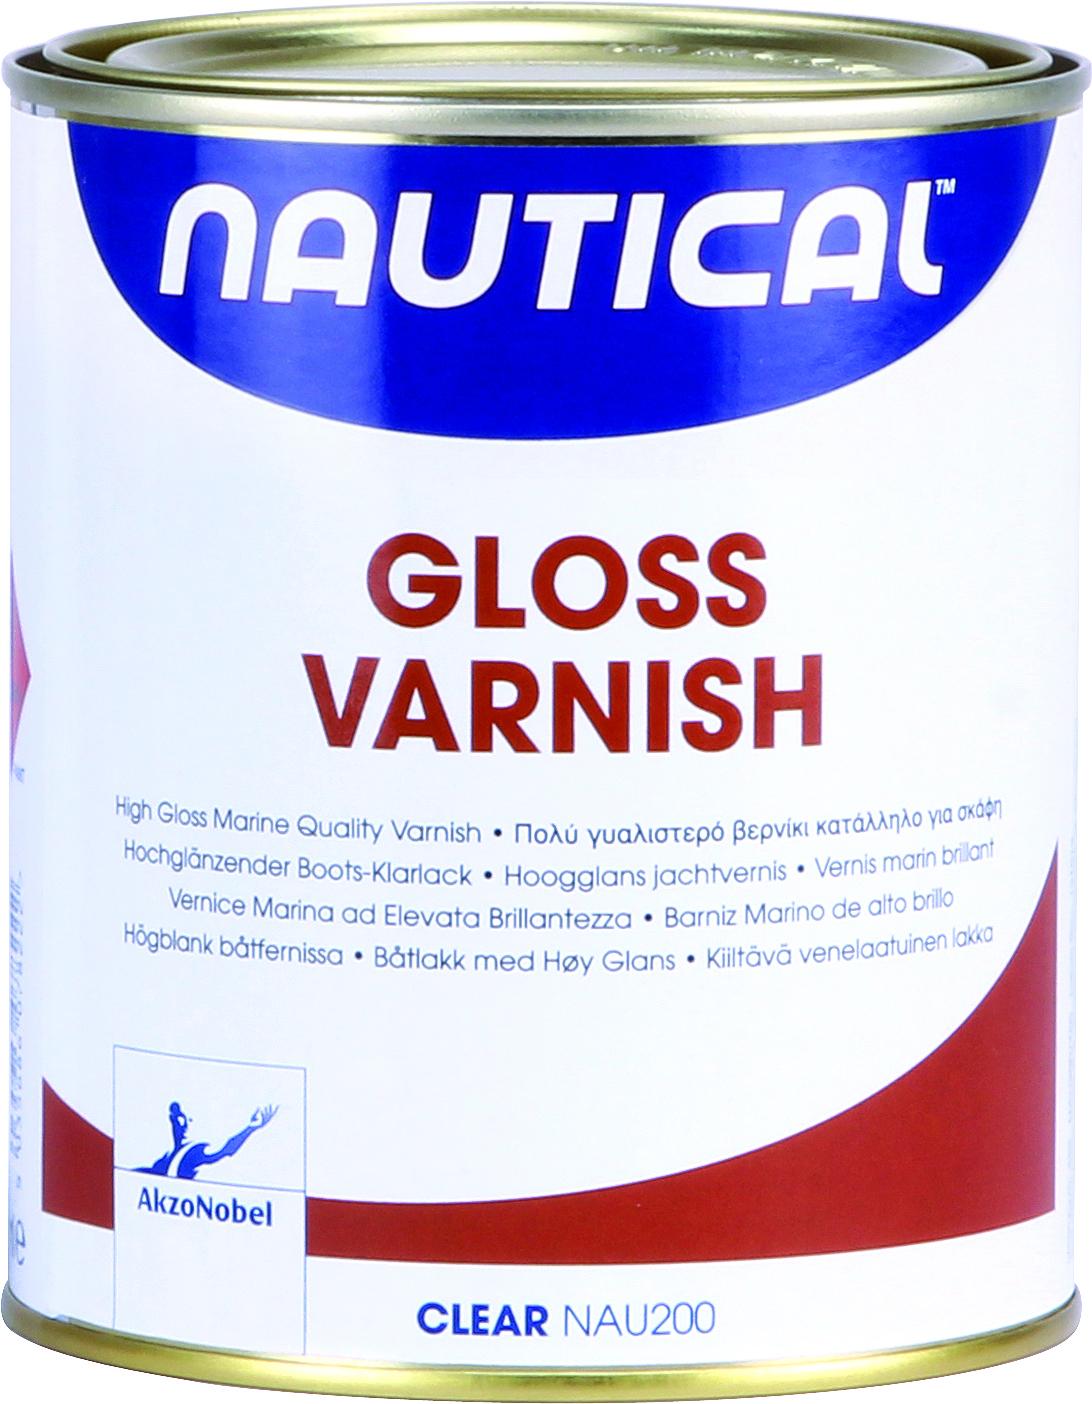 Naut gloss varnish 2,5l